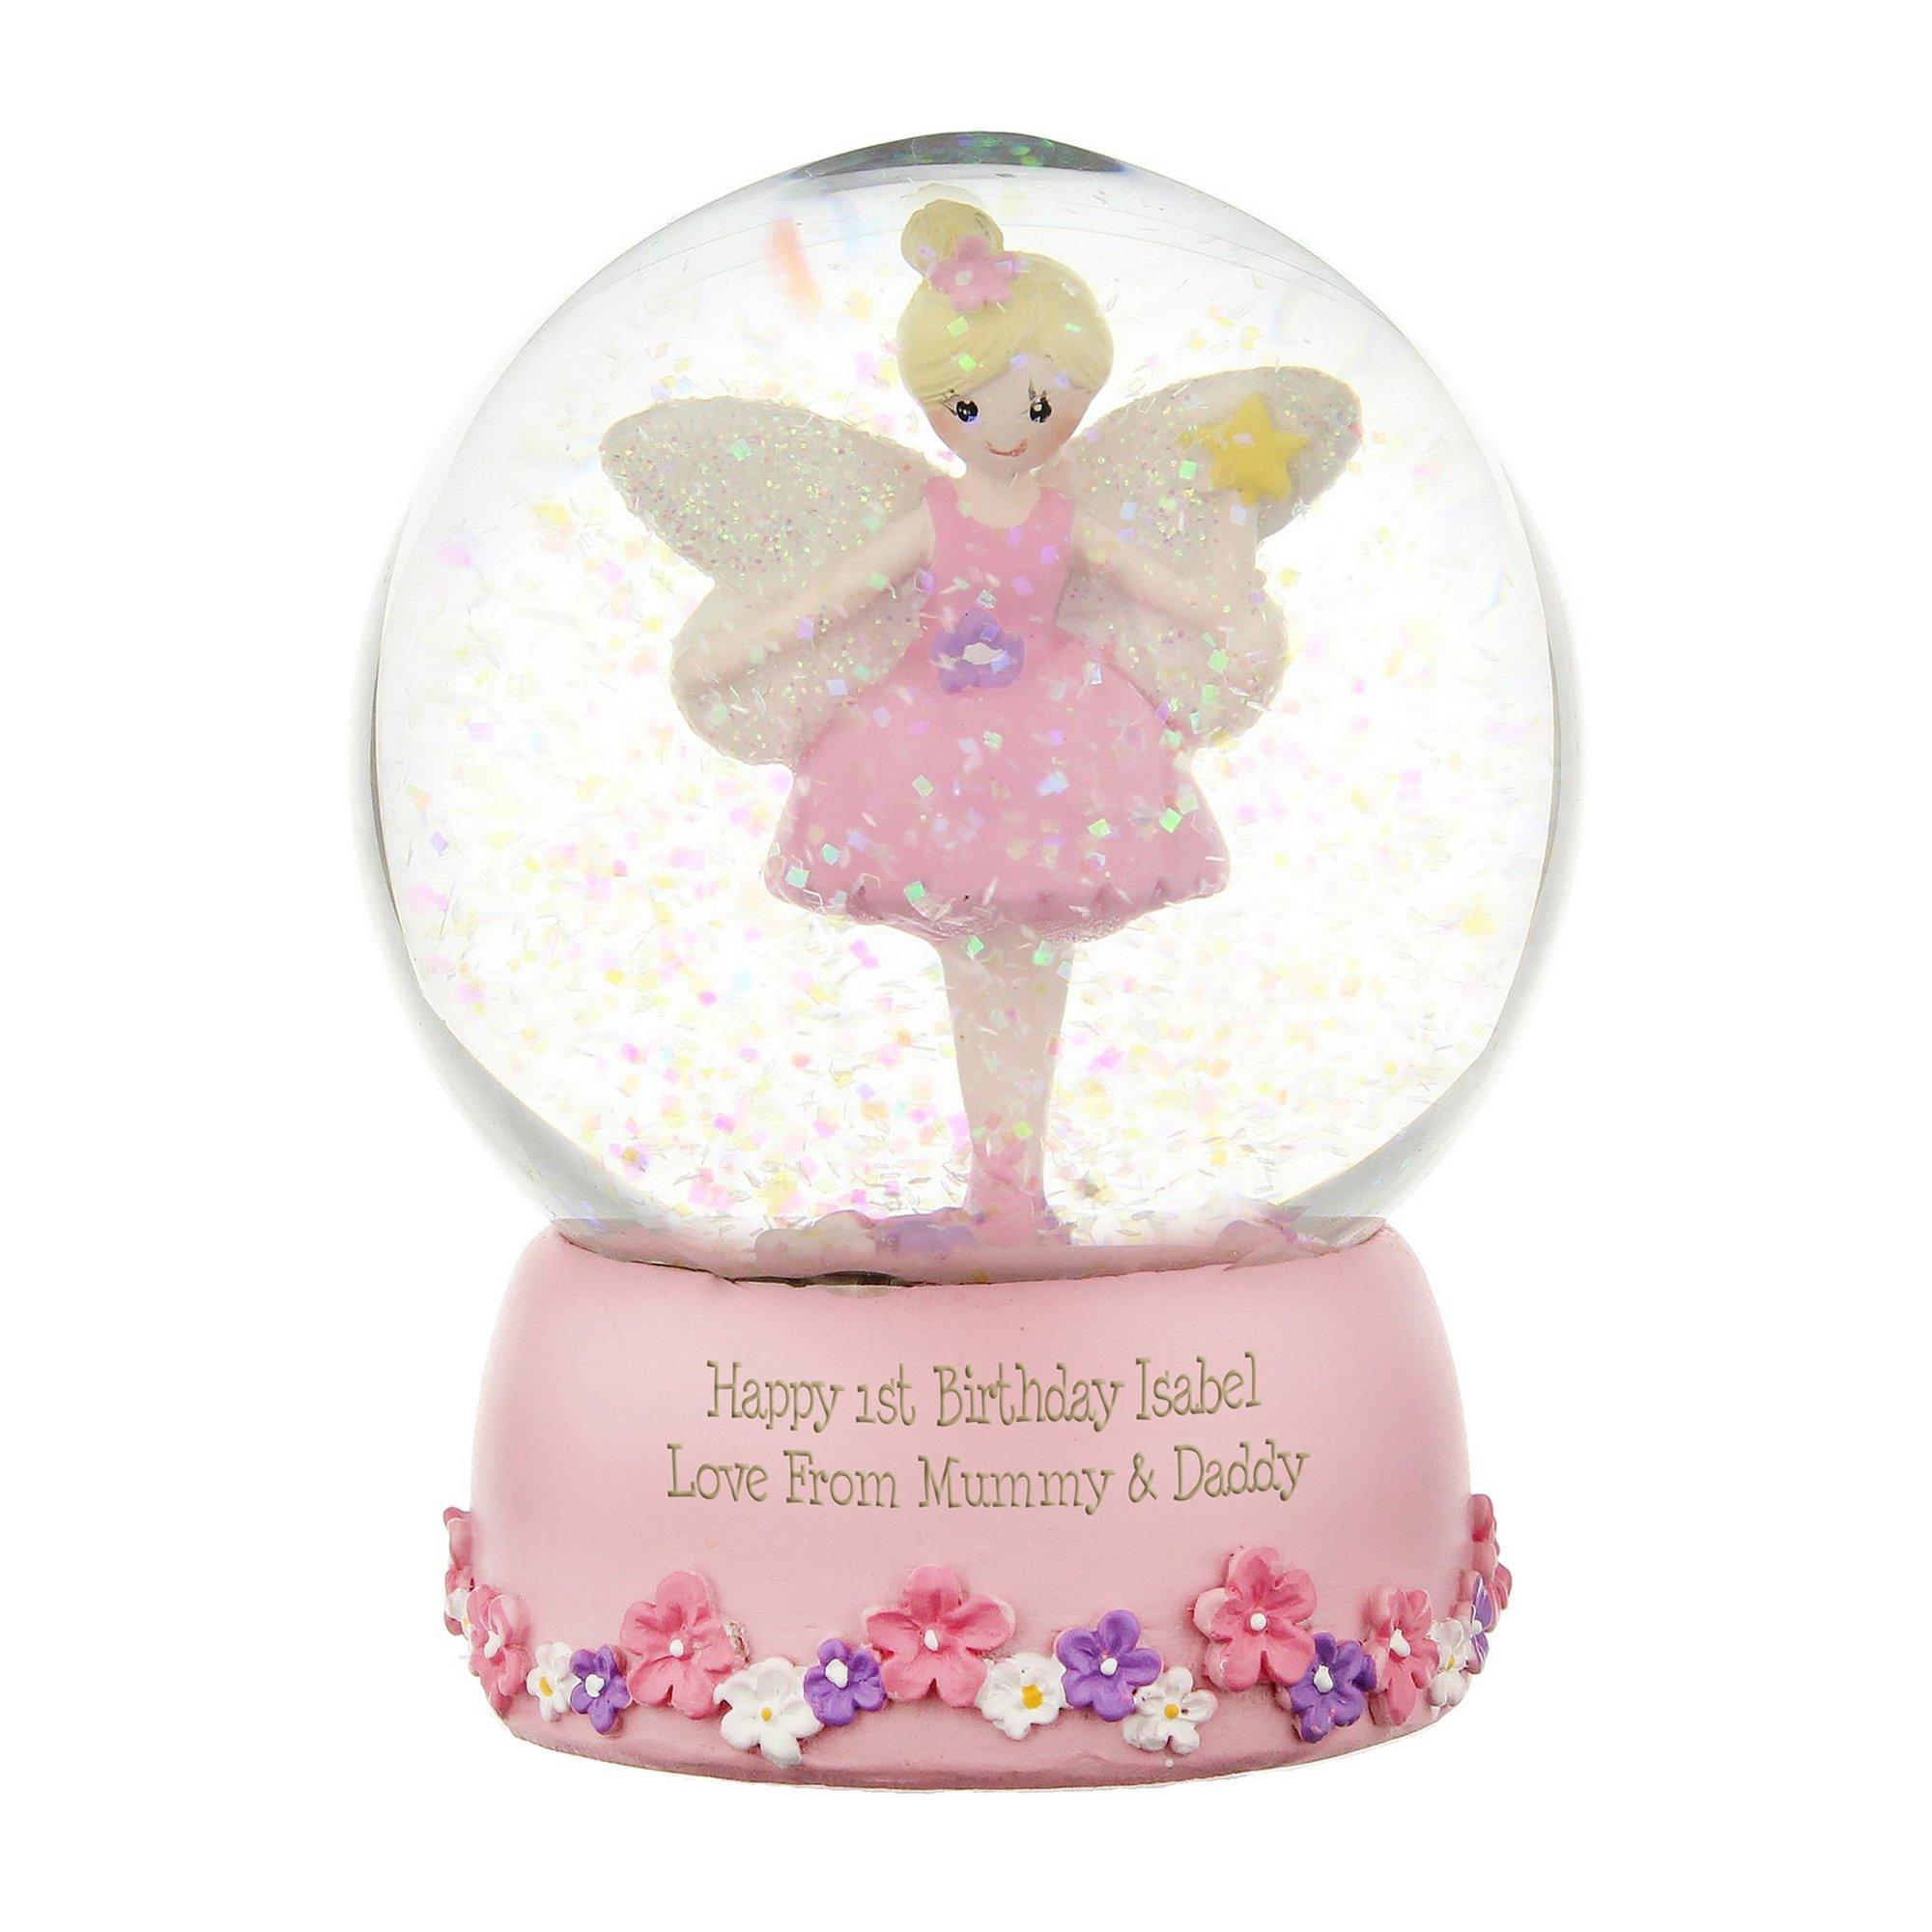 Image of Personalised Fairy Snow Globe